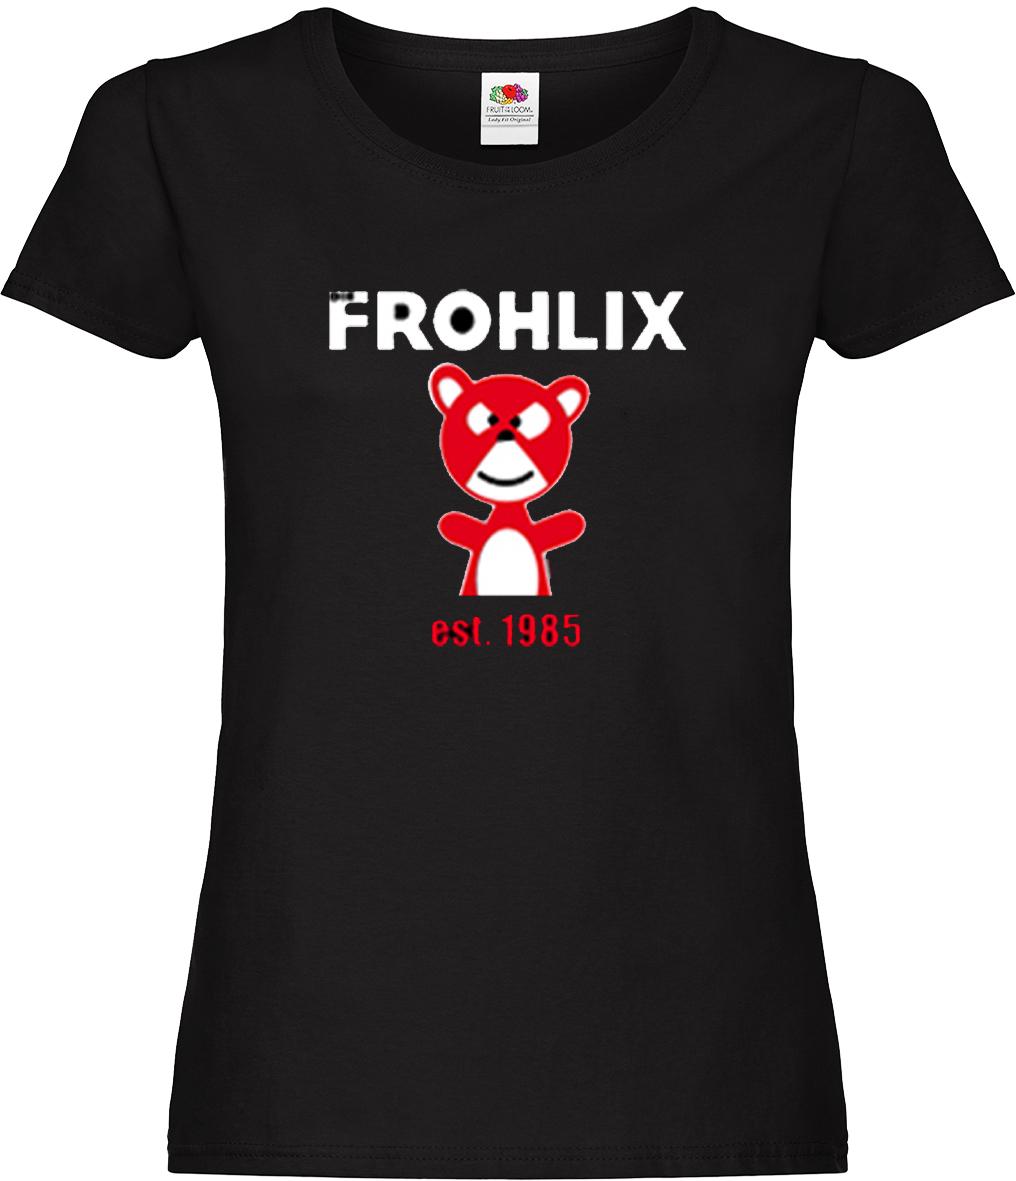 FROHLIX, DIE